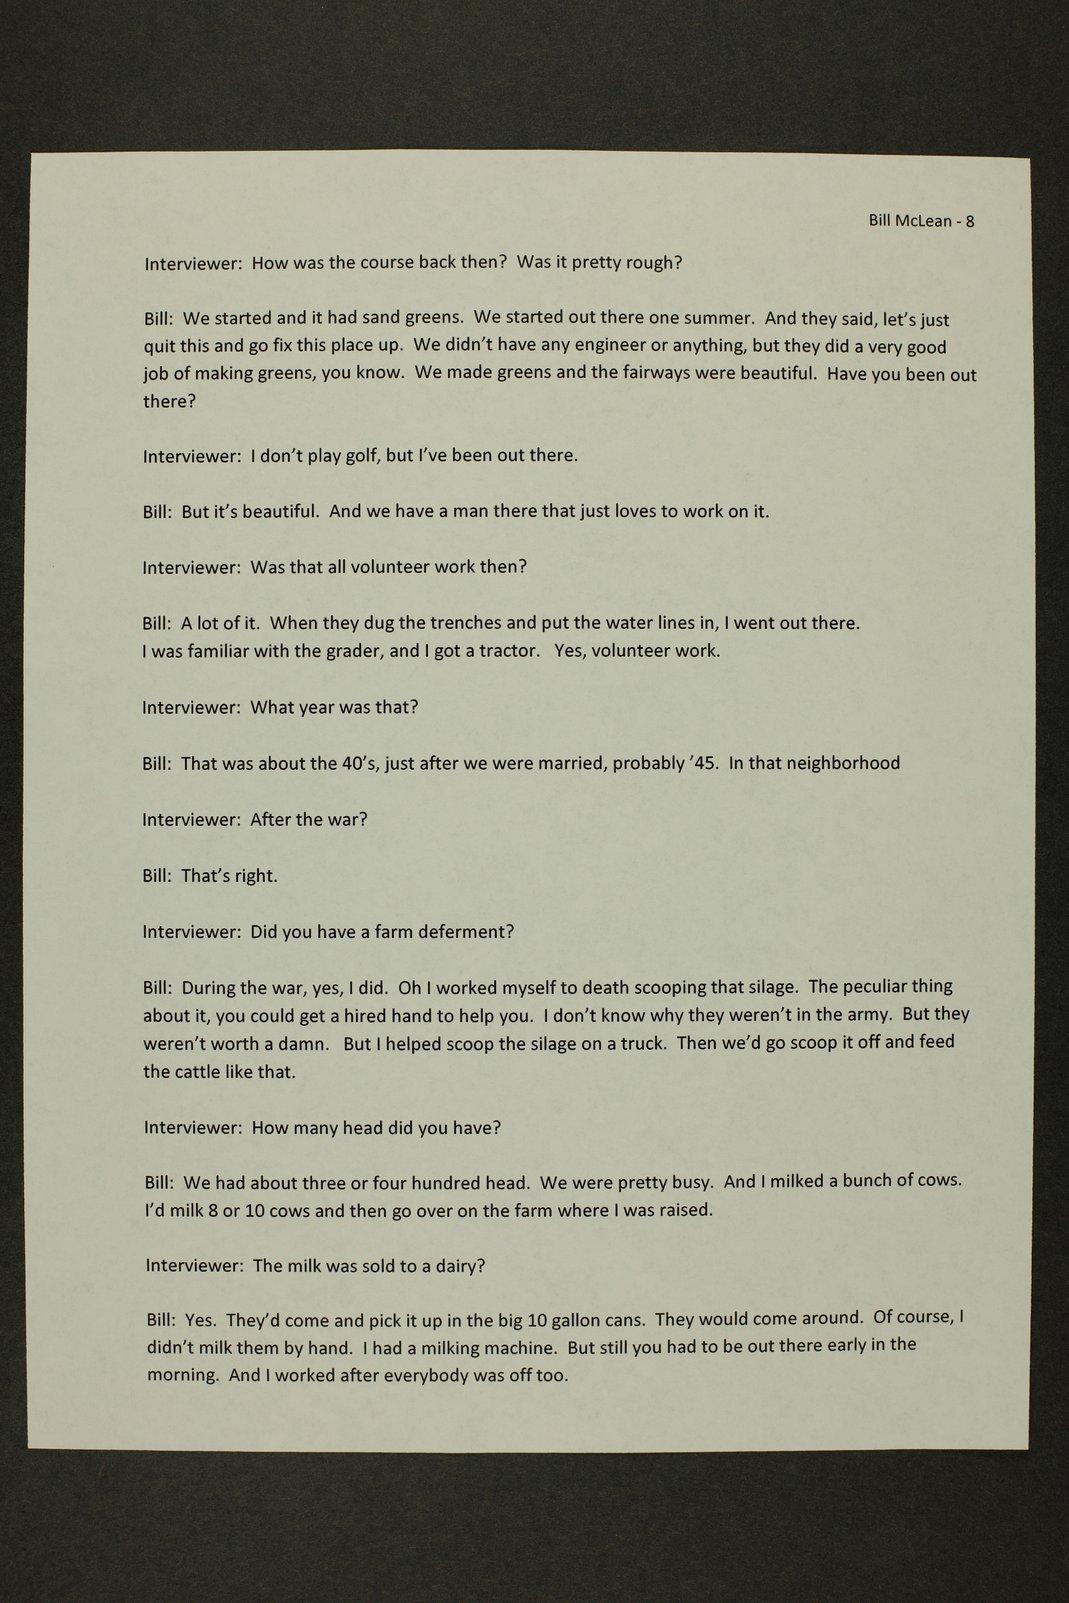 William McLean interview, WWII oral history, Lewis, Kansas - 8